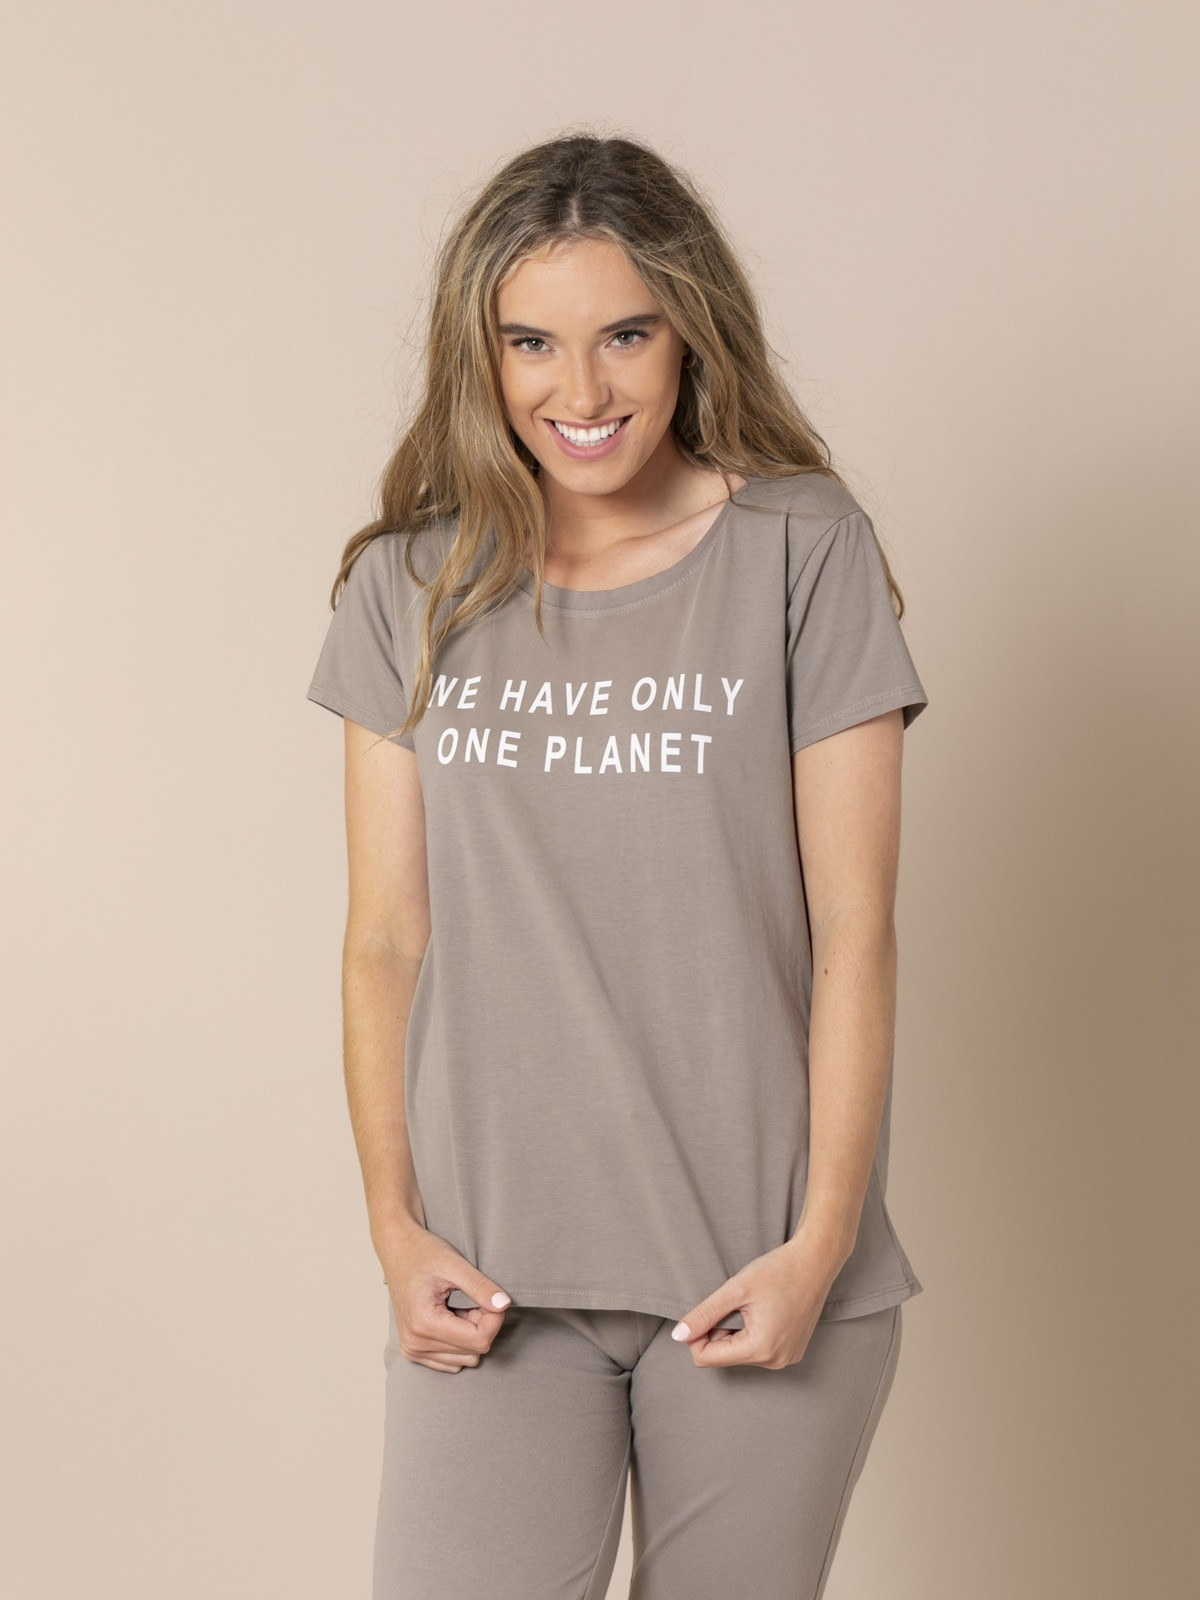 Camiseta mujer mensaje ecofriendly Gris